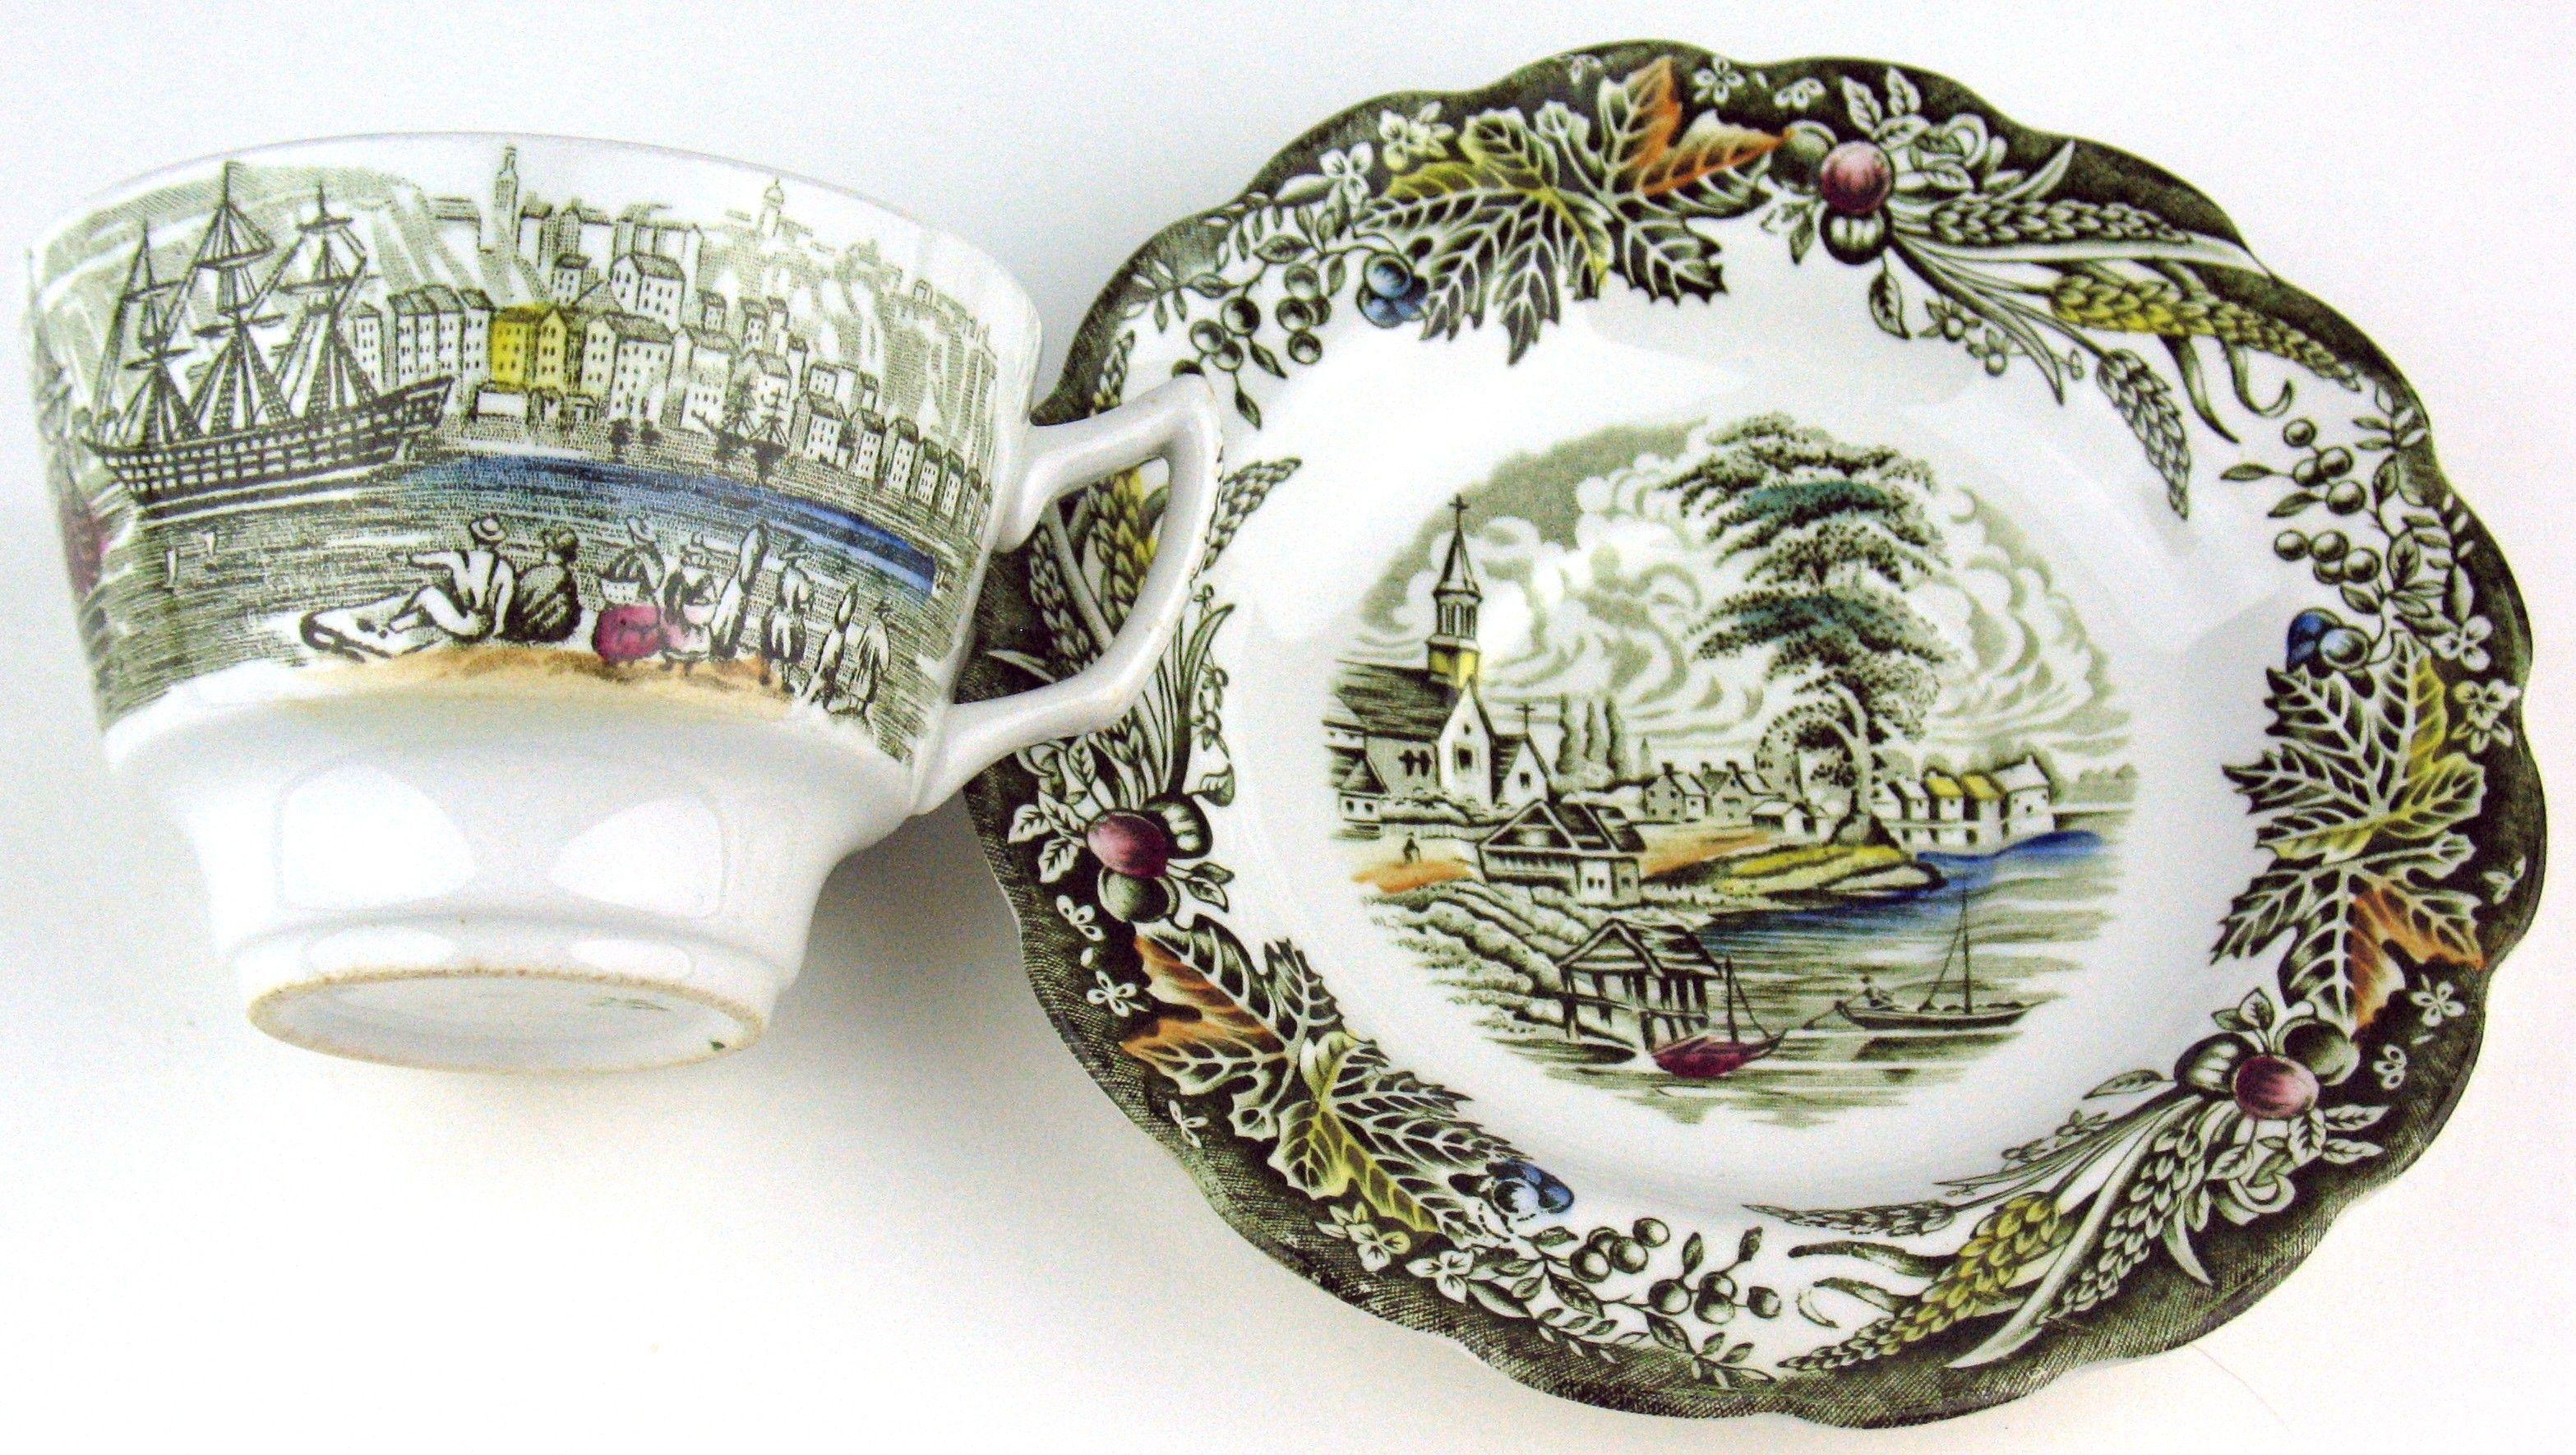 Dinnerware  sc 1 st  Pinterest & Ridgway Heritage Dinner Set - History u0026 Piece Guide | Pottery ...